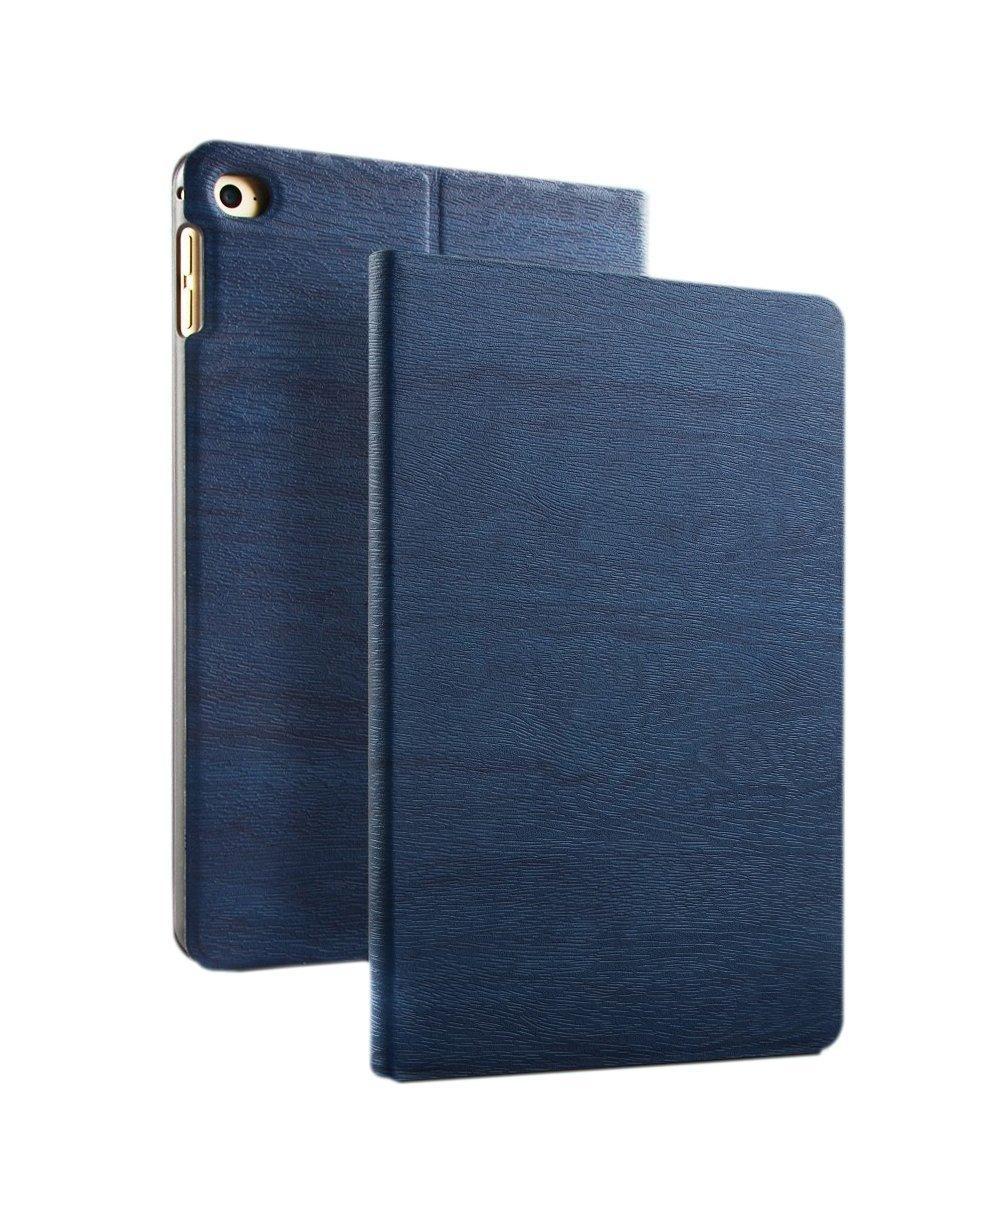 Bao da iPad Mini 123 Vân Gỗ .Bao da mới siêu hot năm 2017 - PKCB